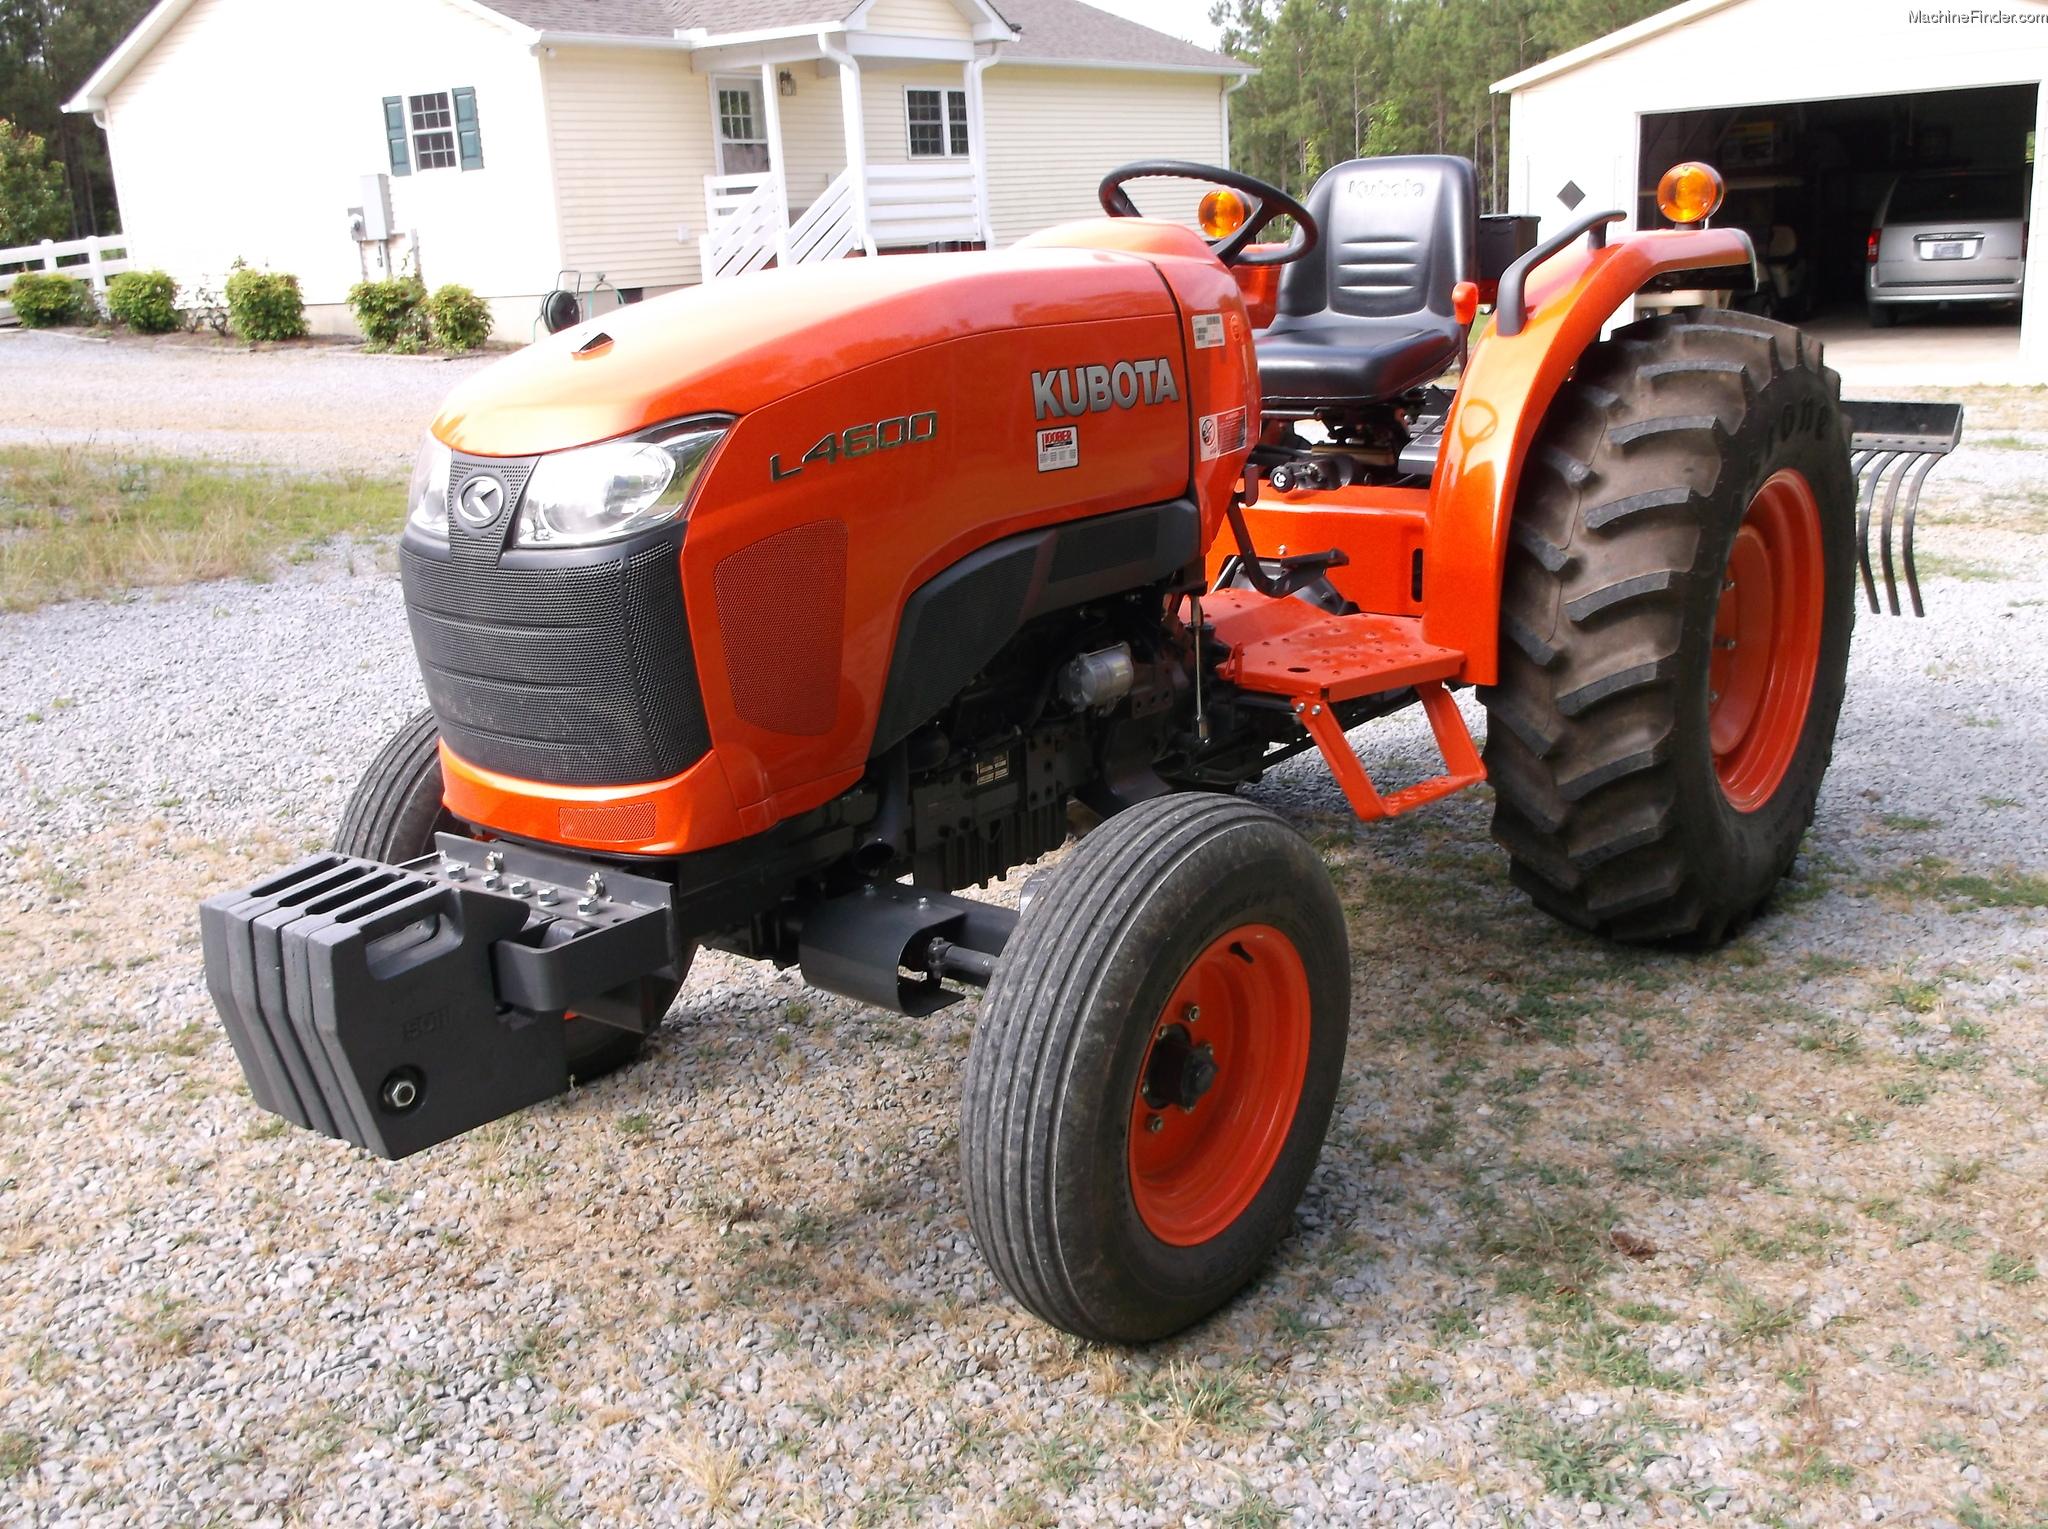 Kubota Tractor Weights : Kubota tractor weights images reverse search